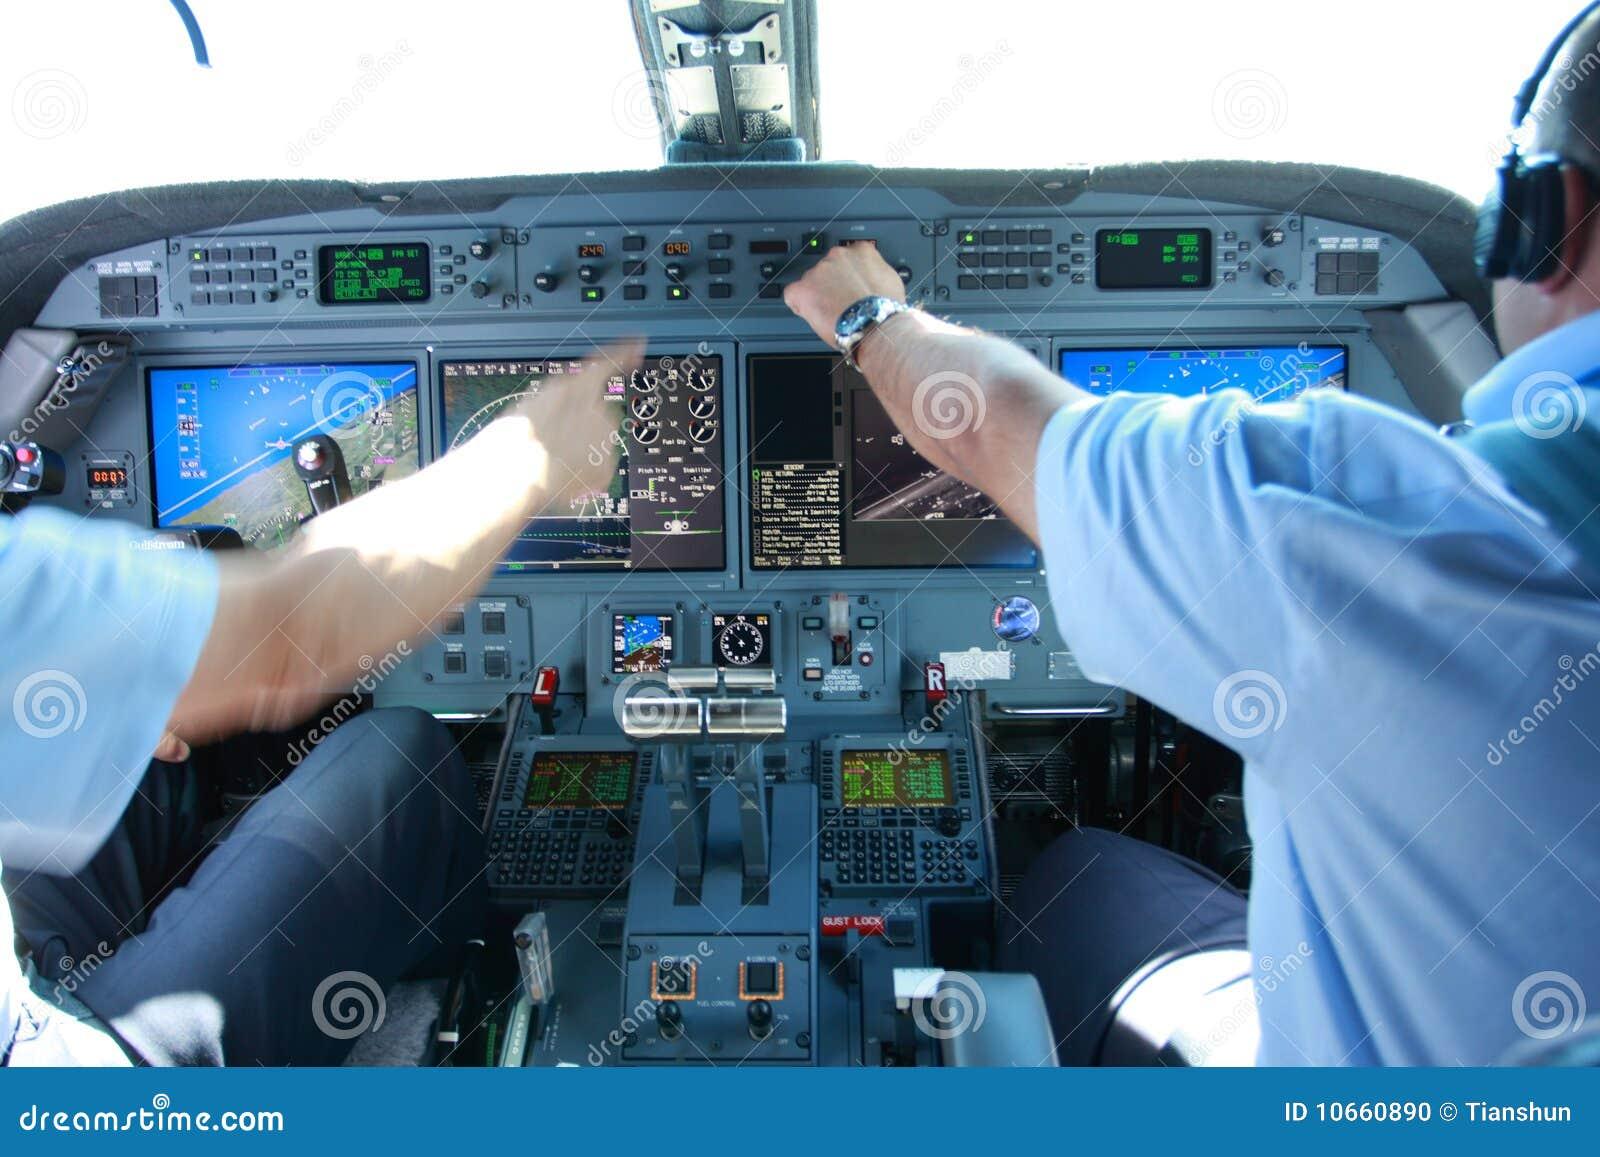 Modern airplane inflight